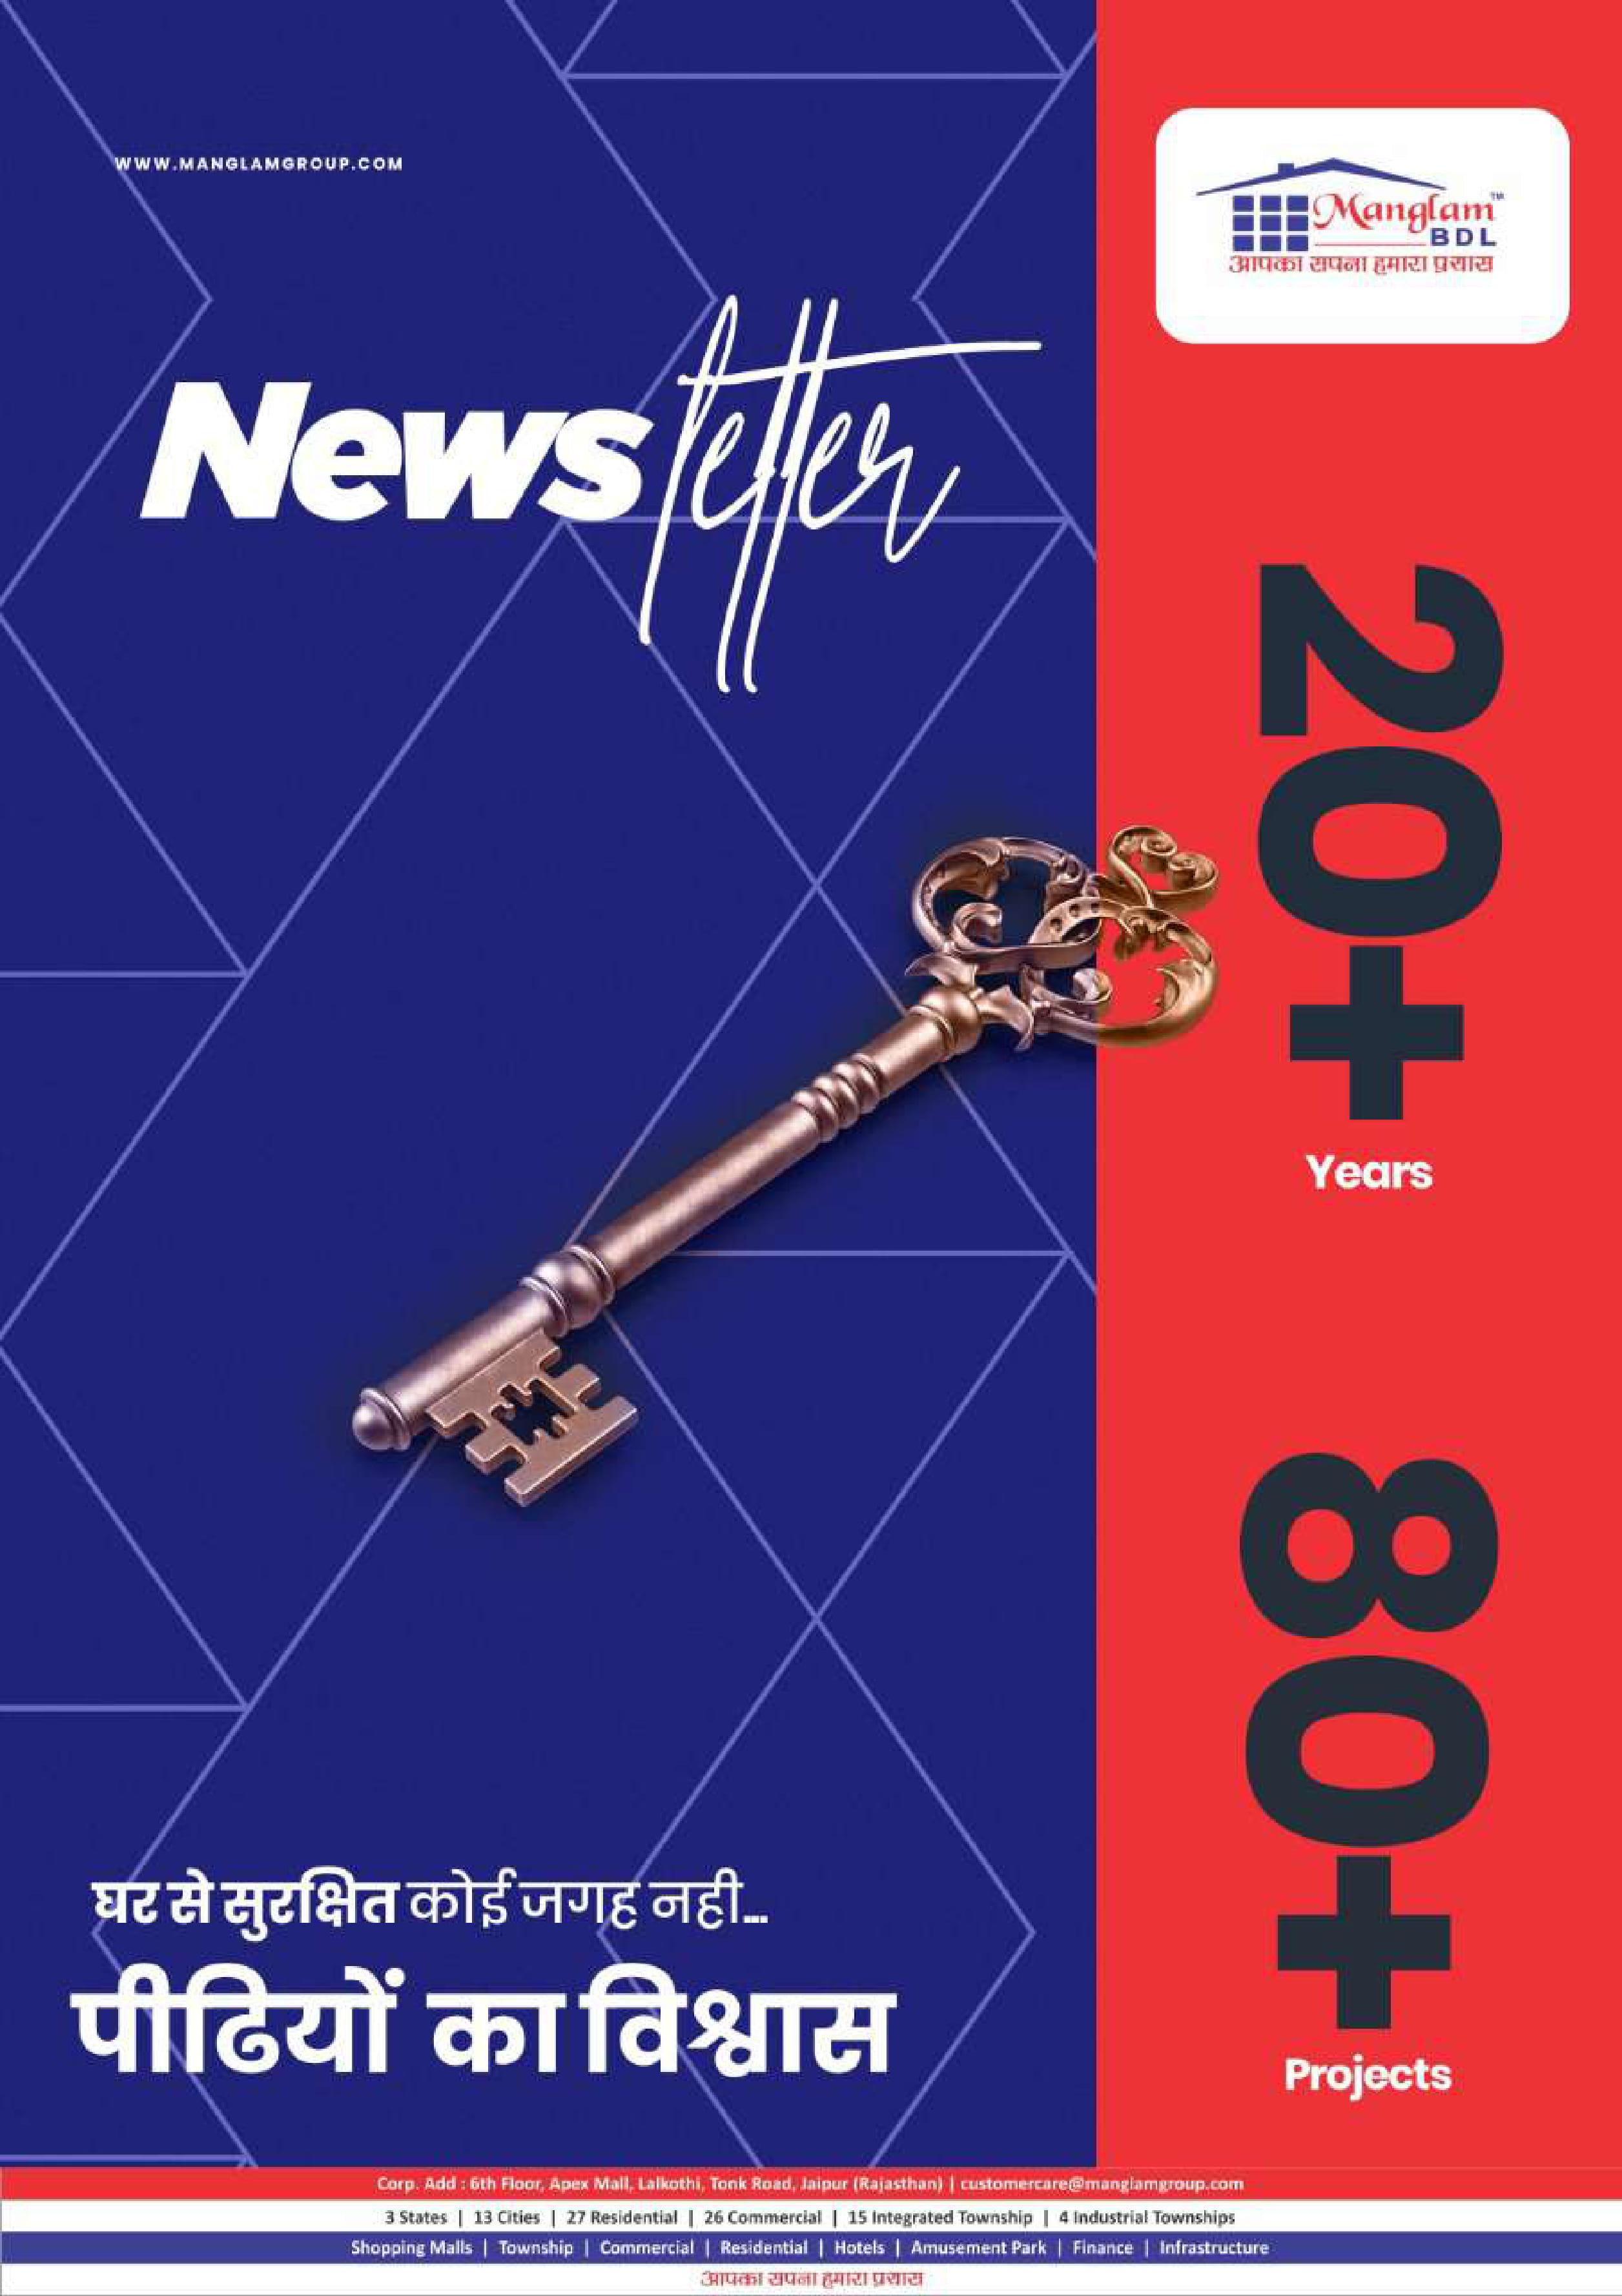 Manglam Group Jaipur - Lockdown Diaries-01